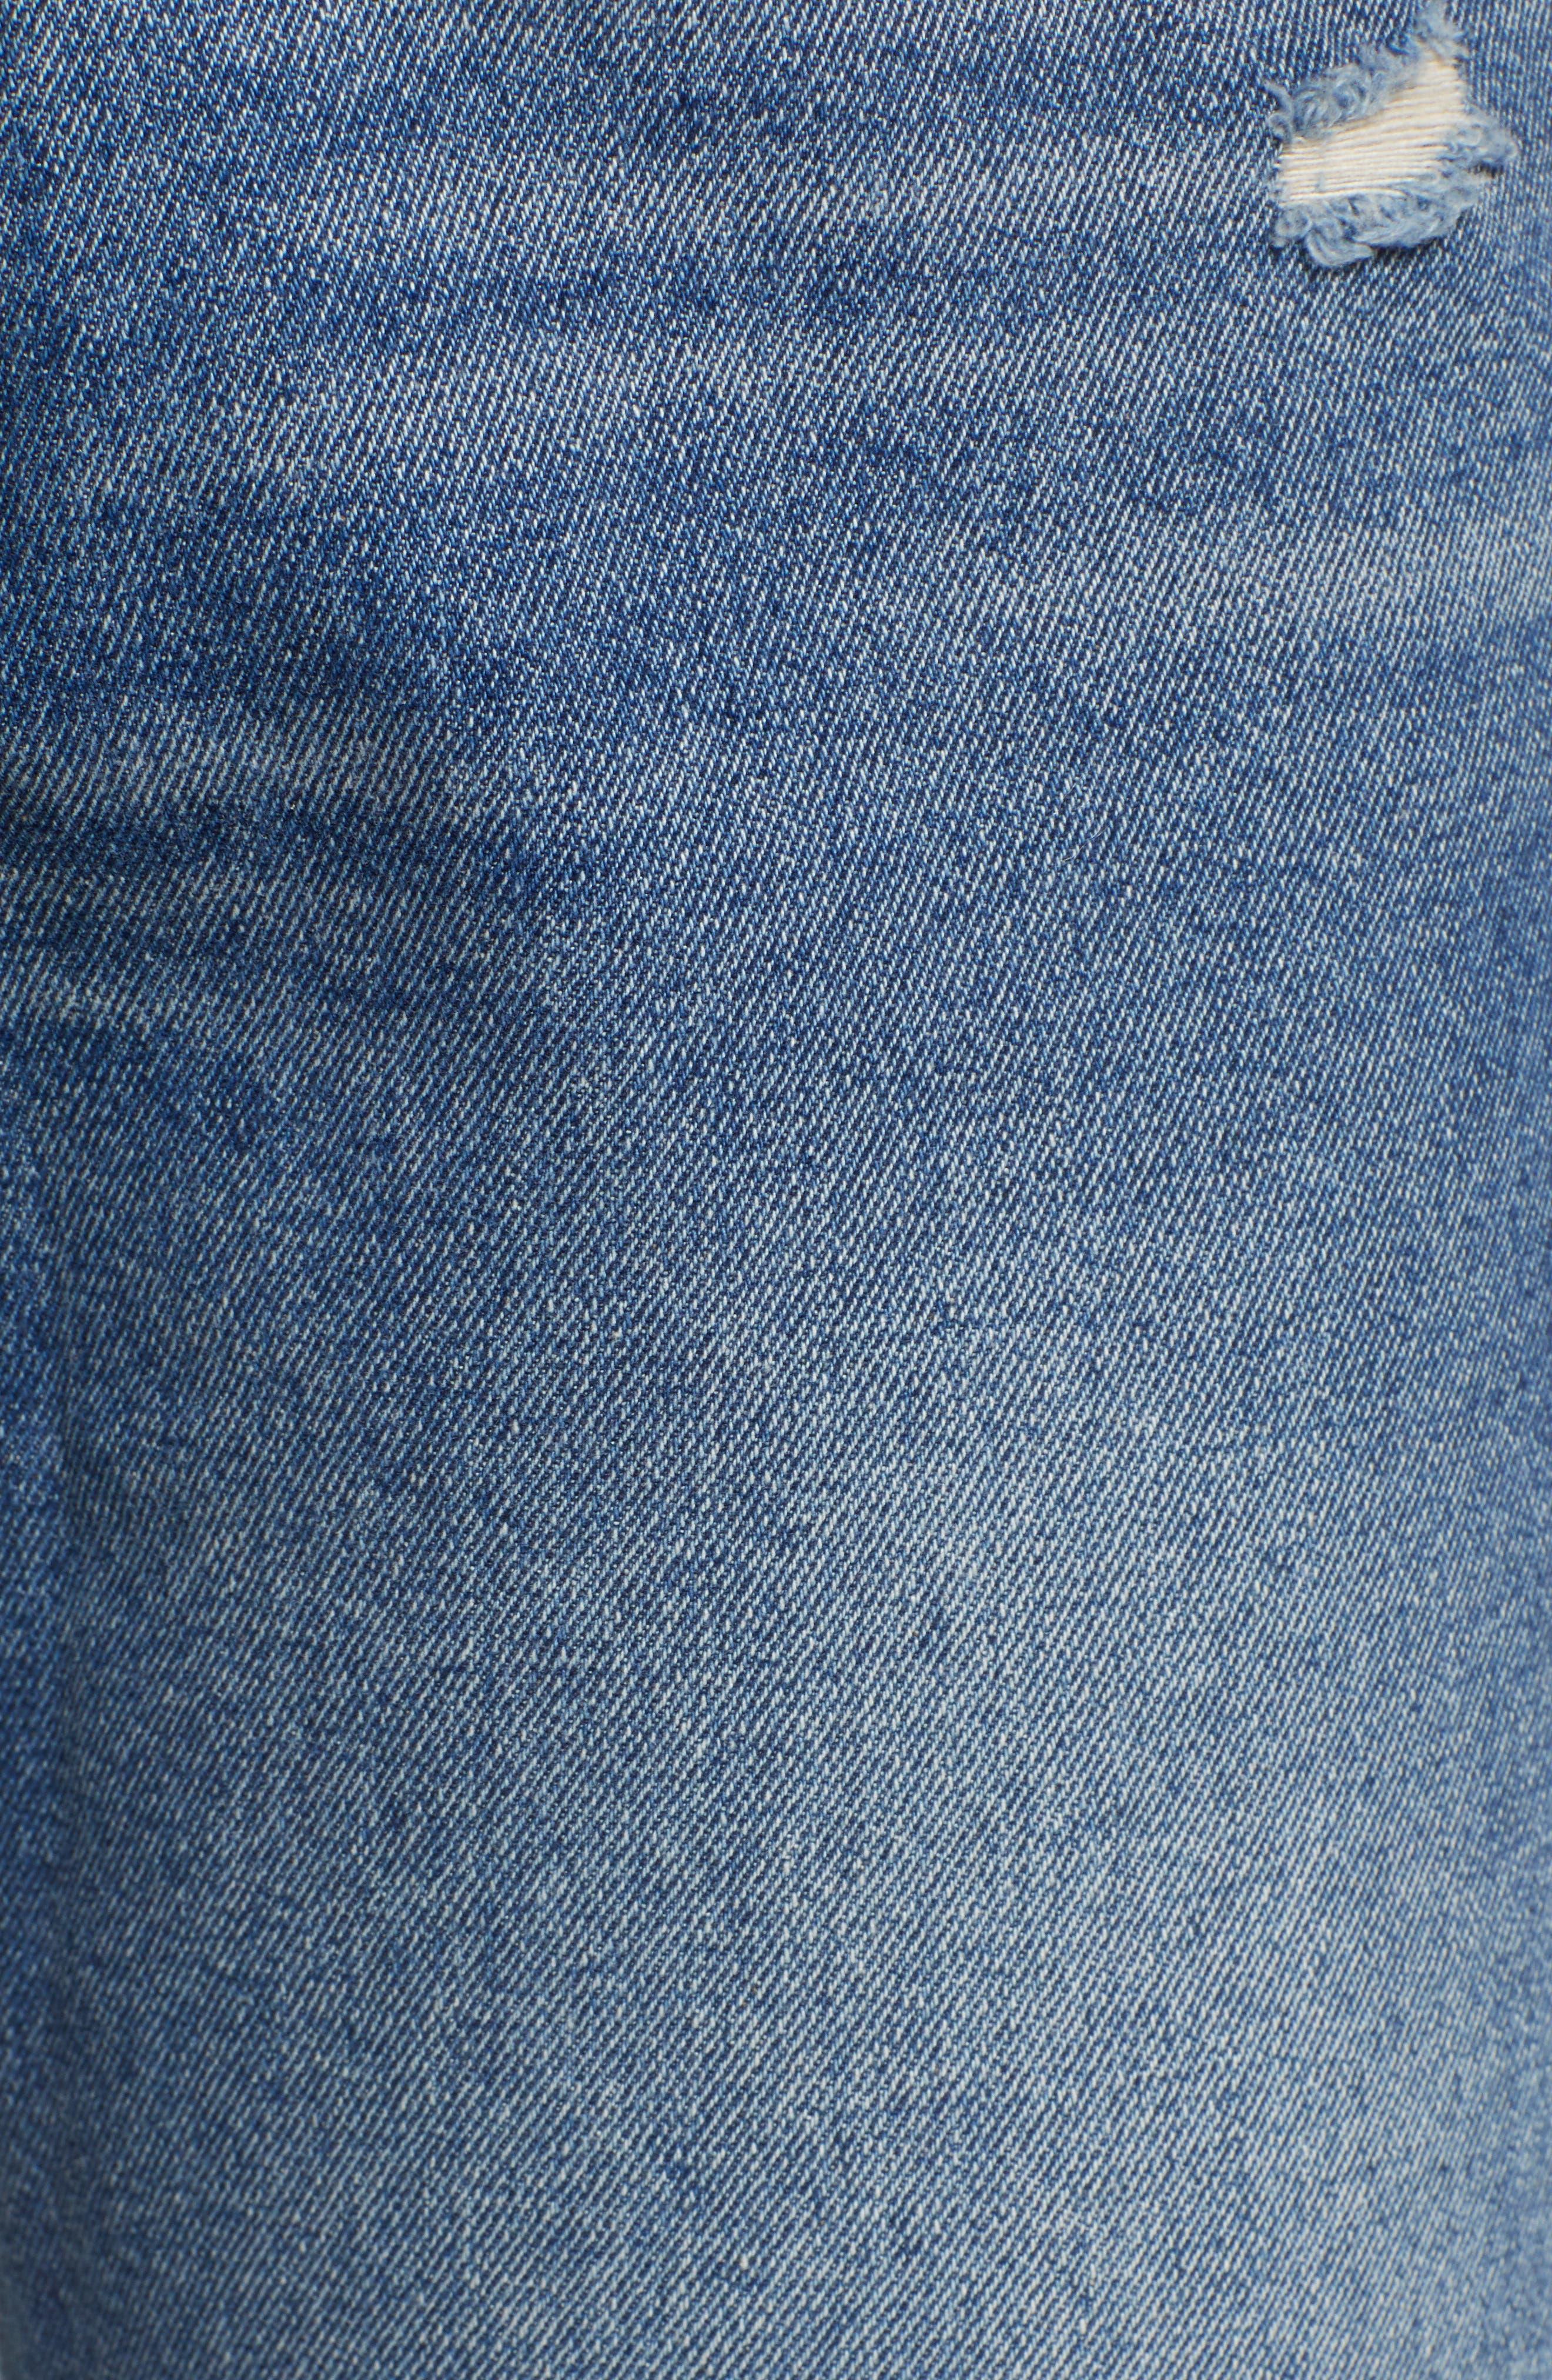 SP BLACK,                             Cuffed Ripped Boyfriend Jeans,                             Alternate thumbnail 6, color,                             420